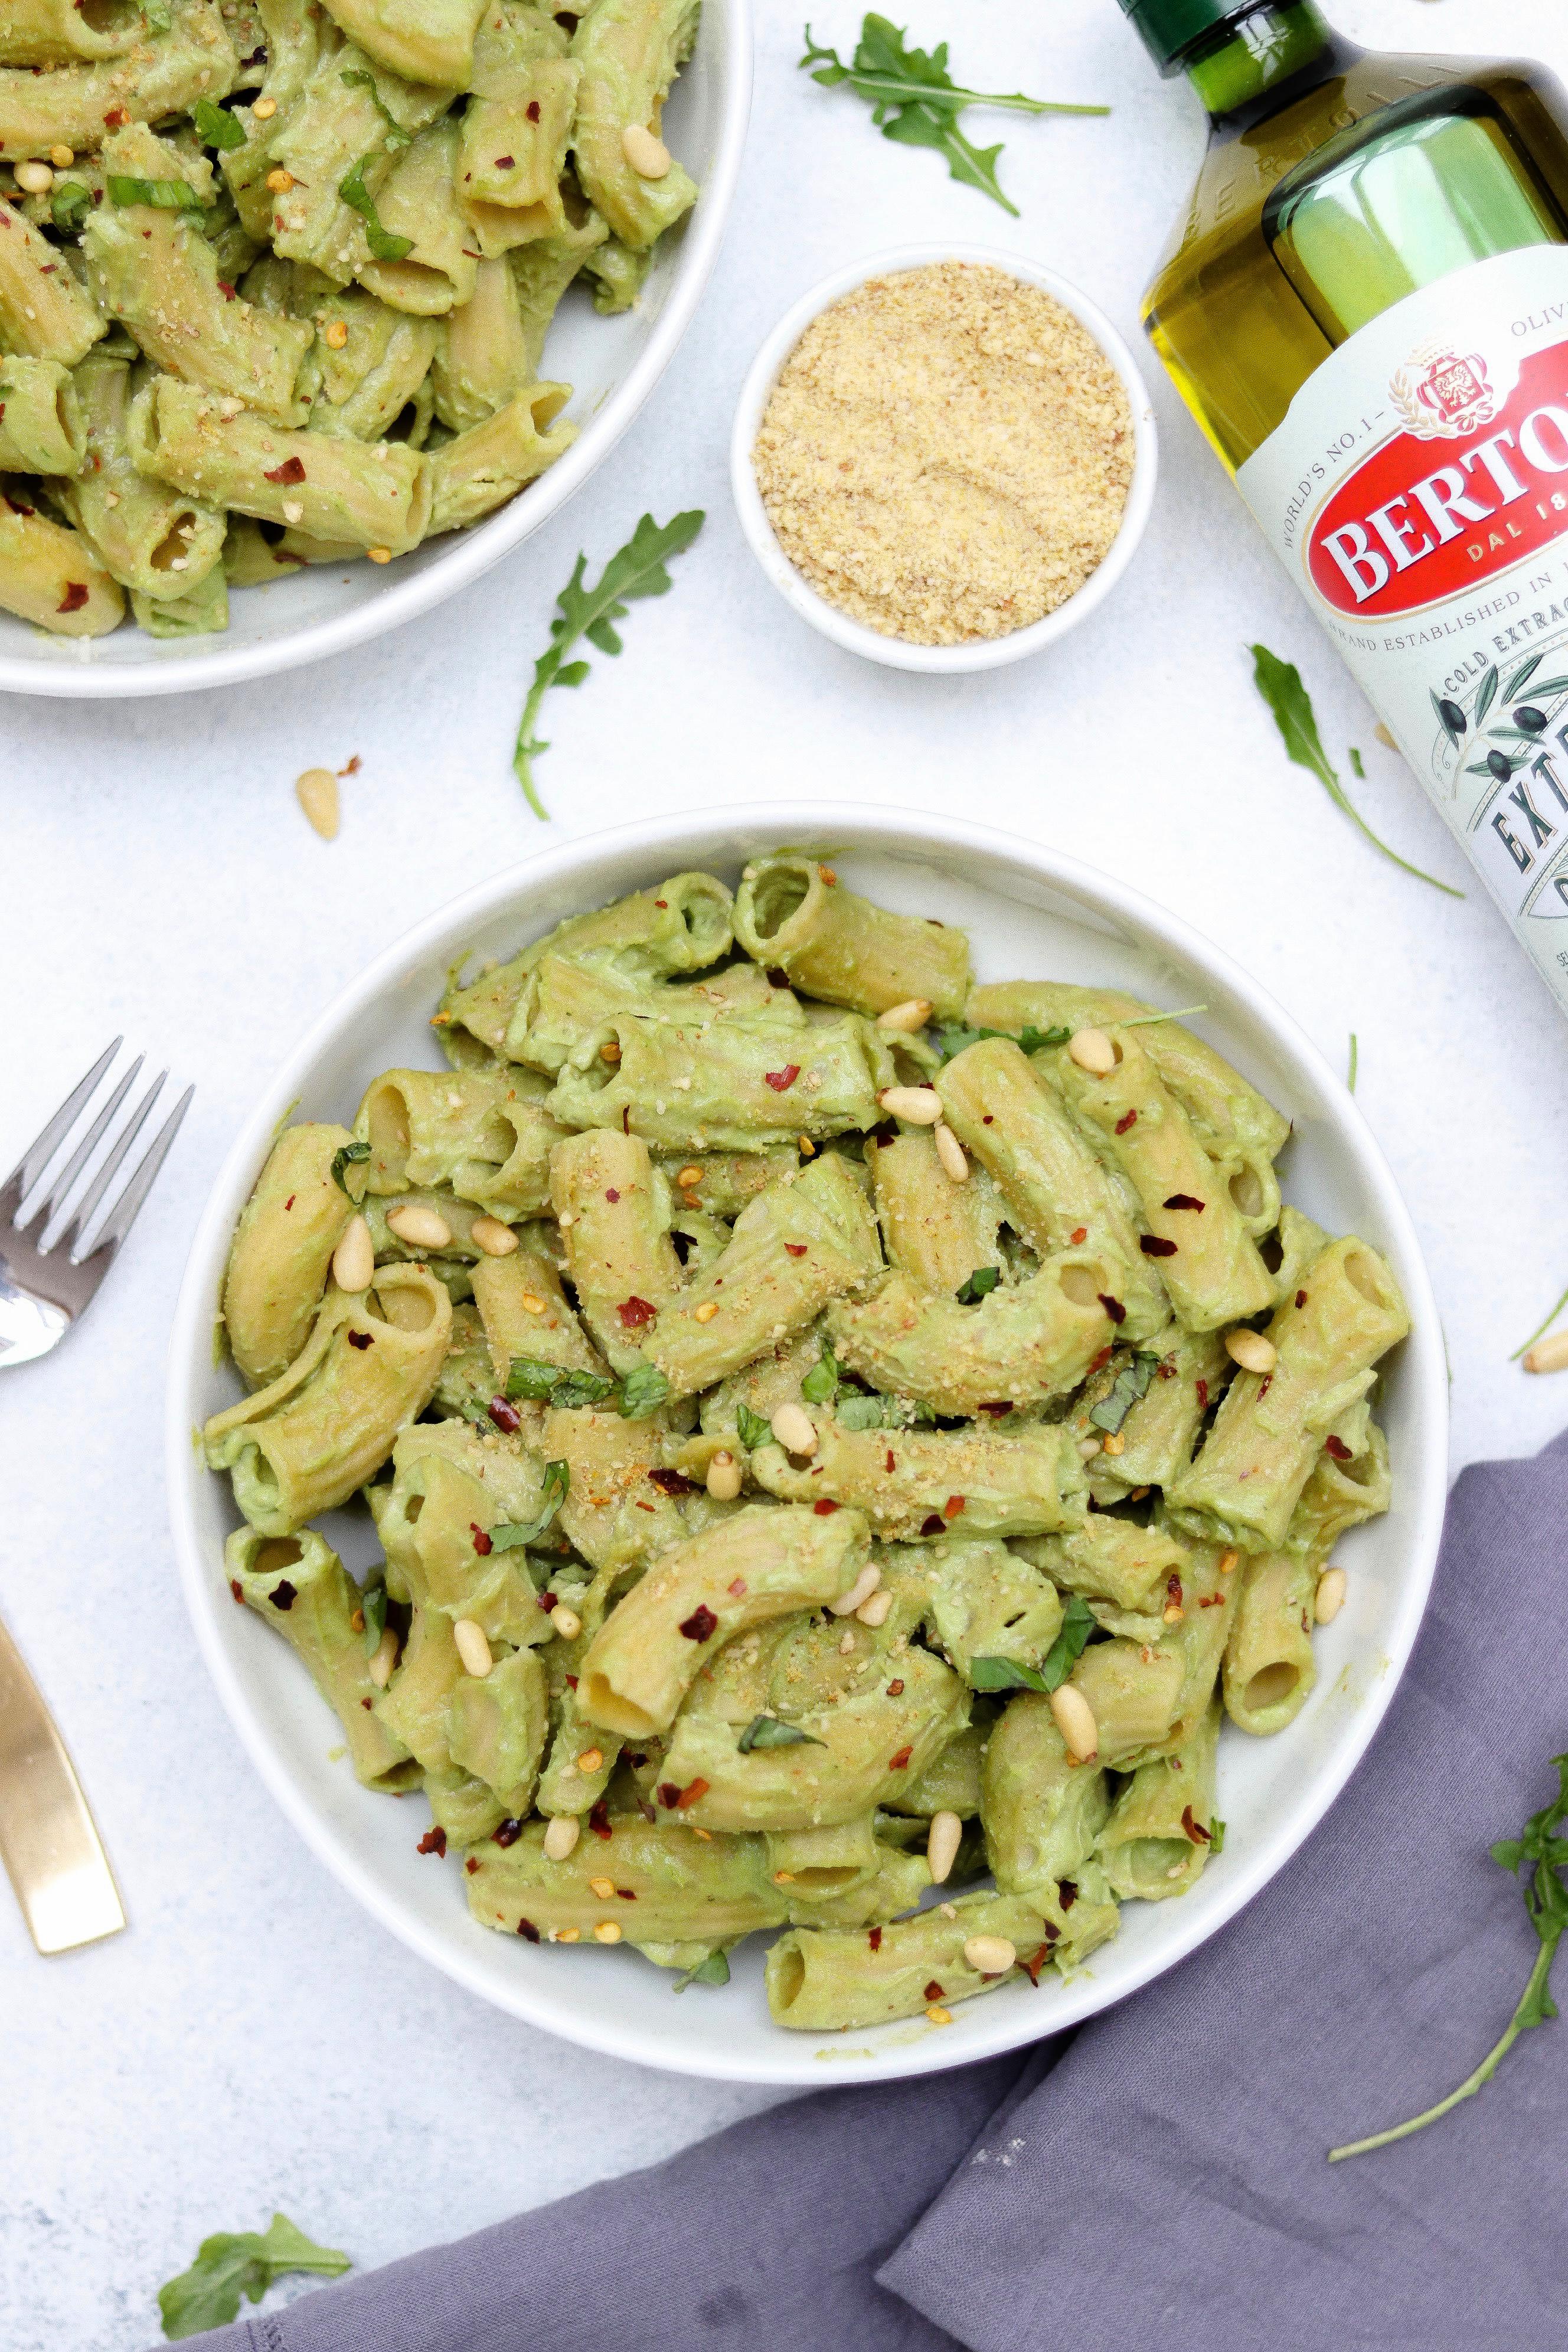 Bertolli Extra Virgin Olive Oil with Avocado Pesto Pasta